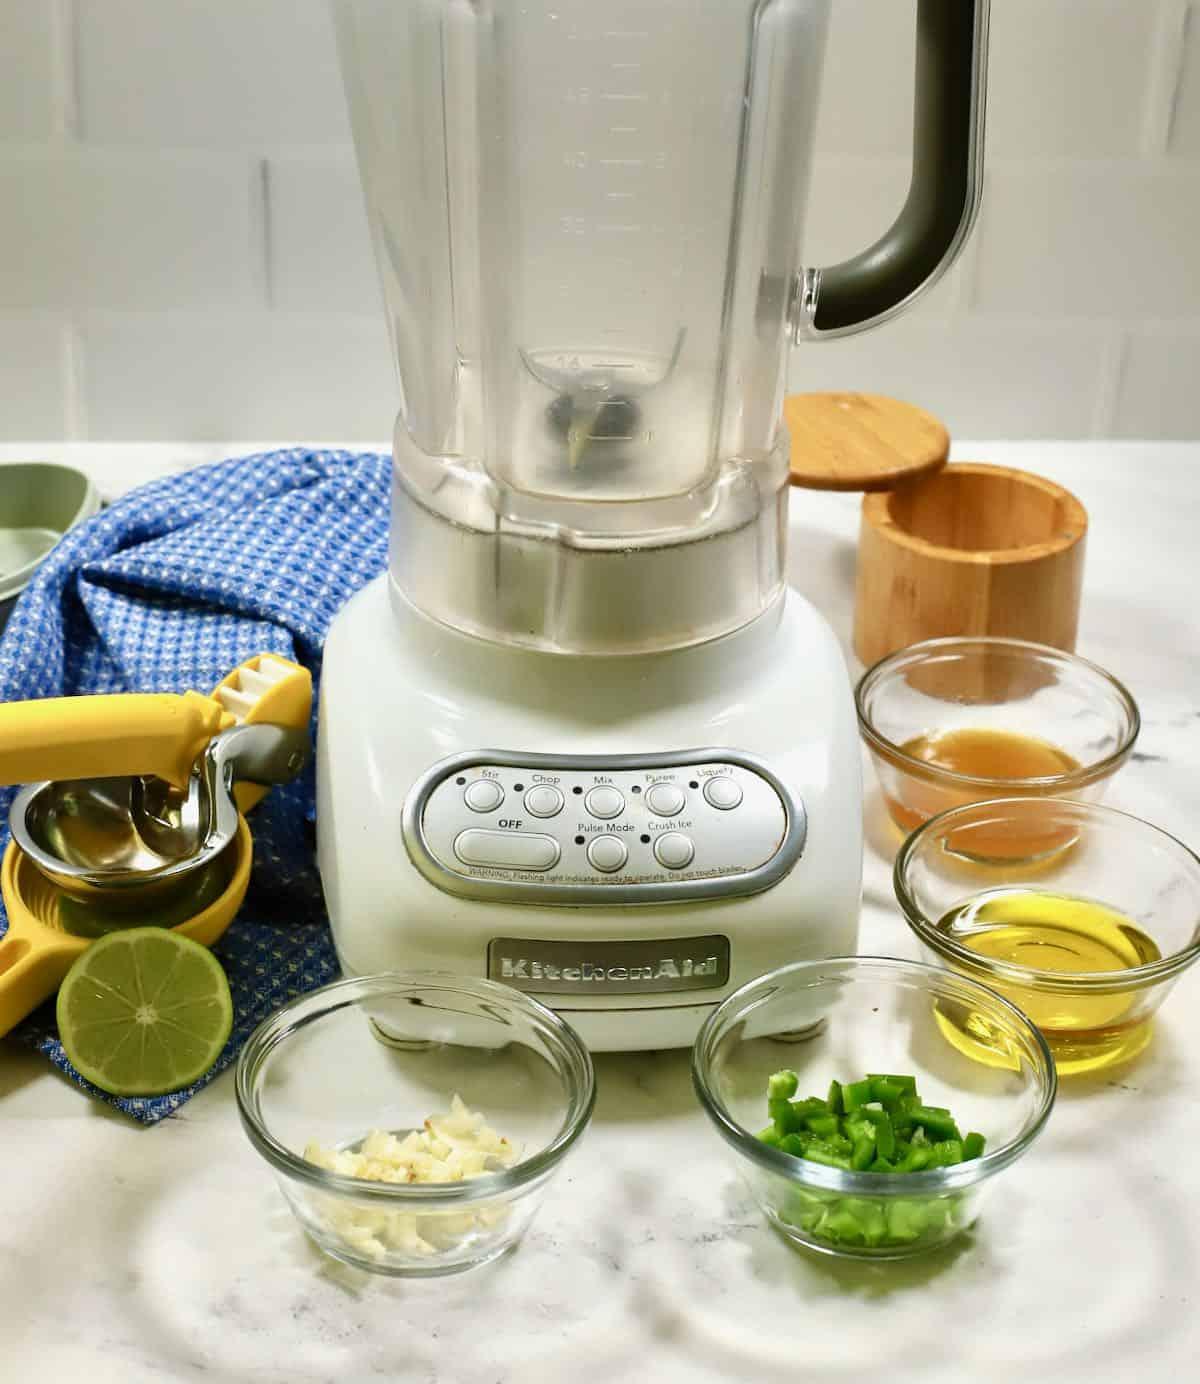 A blender with salad dressing ingredients.